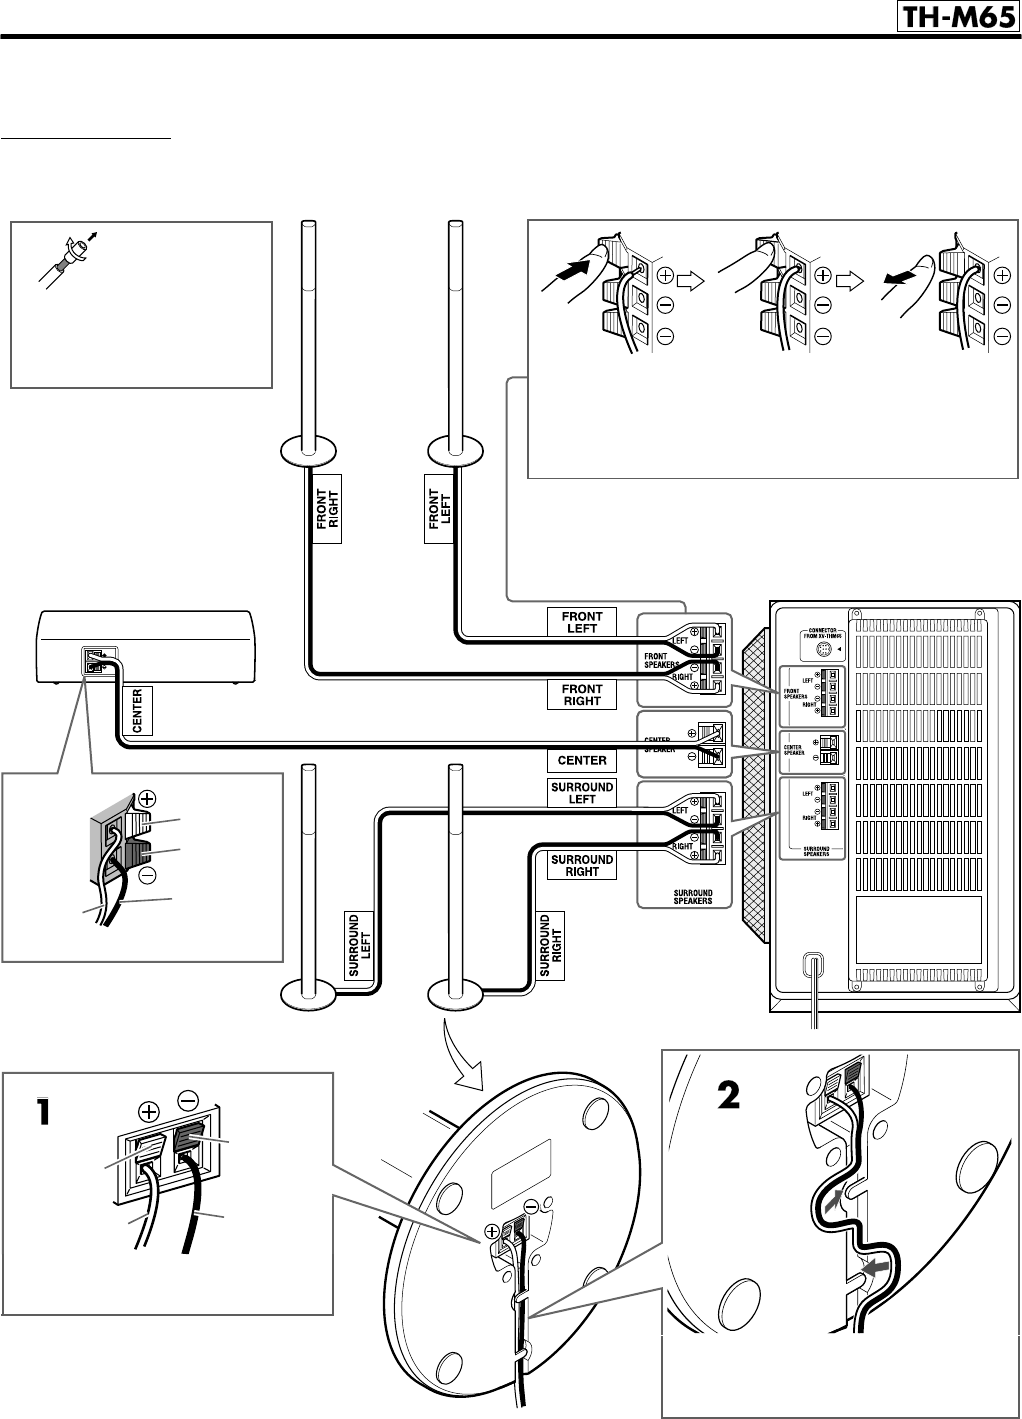 Jvc Users Manual TH M65/TH M55/TH M45